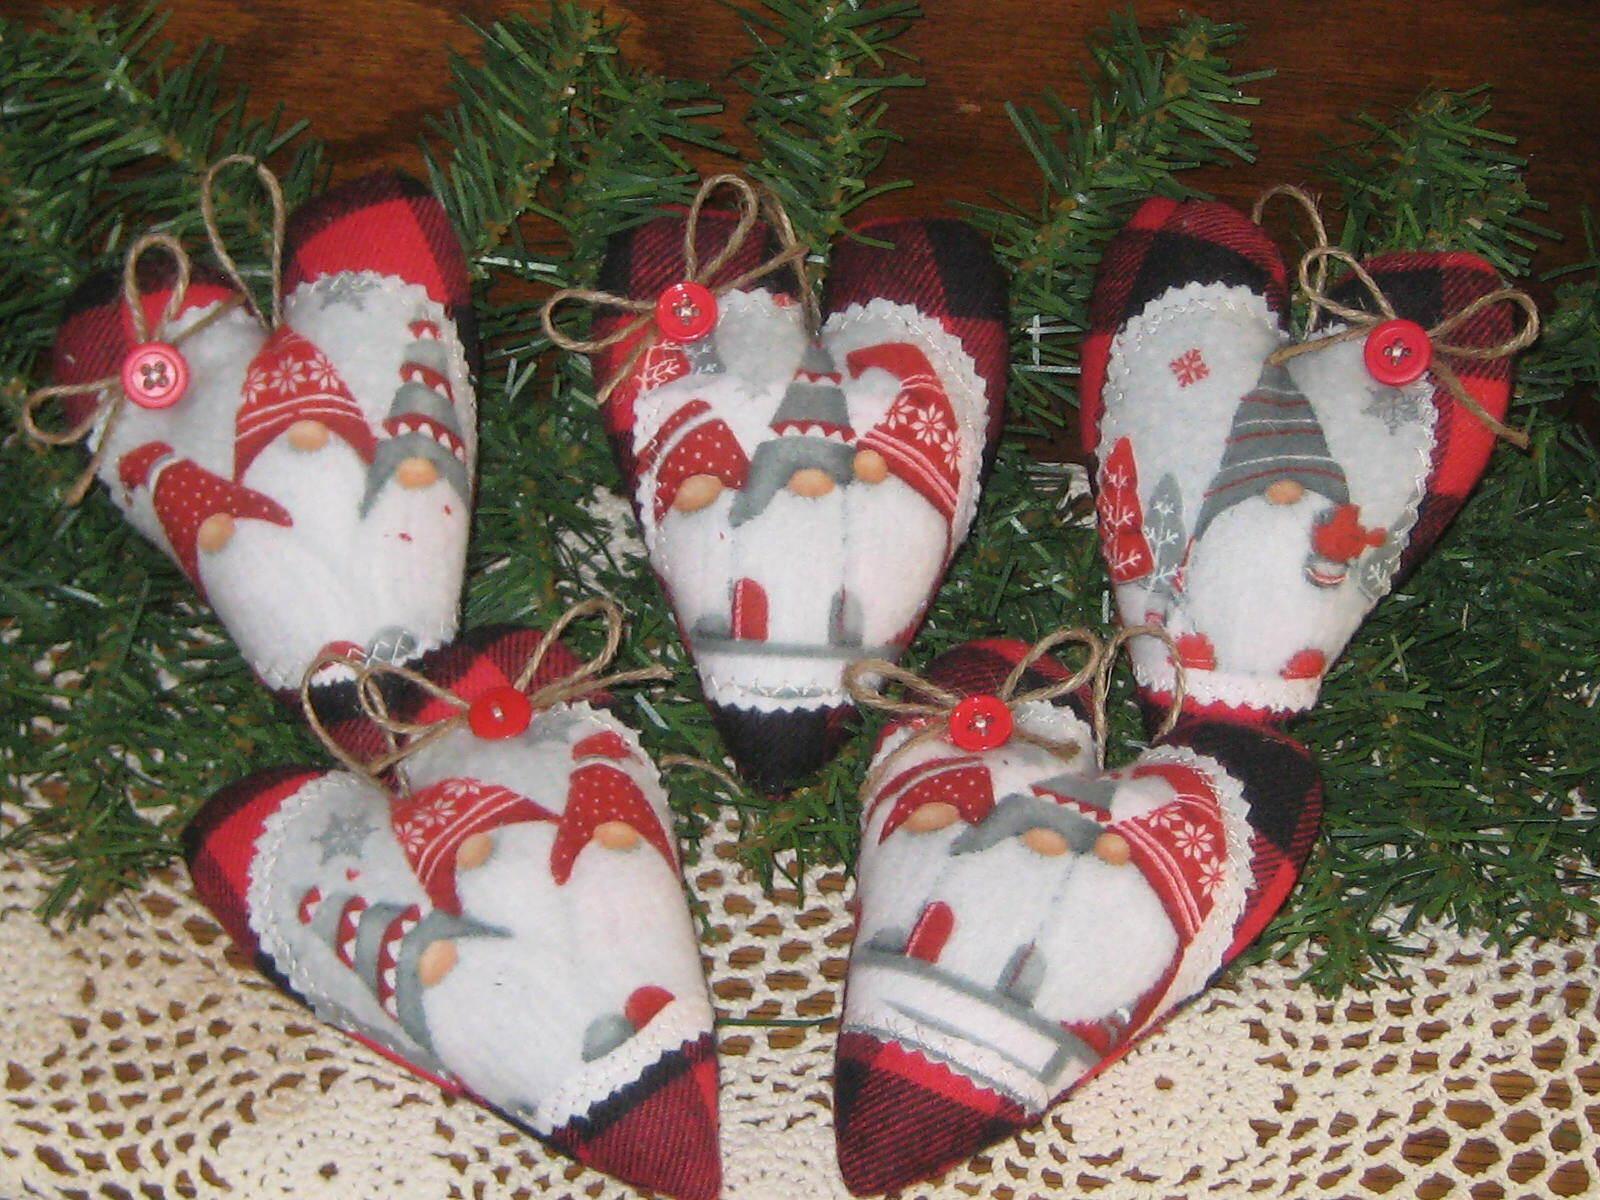 5 Gnome Hearts Buffalo Plaid Fabric Country Christmas Decor Tree Ornaments - $21.95